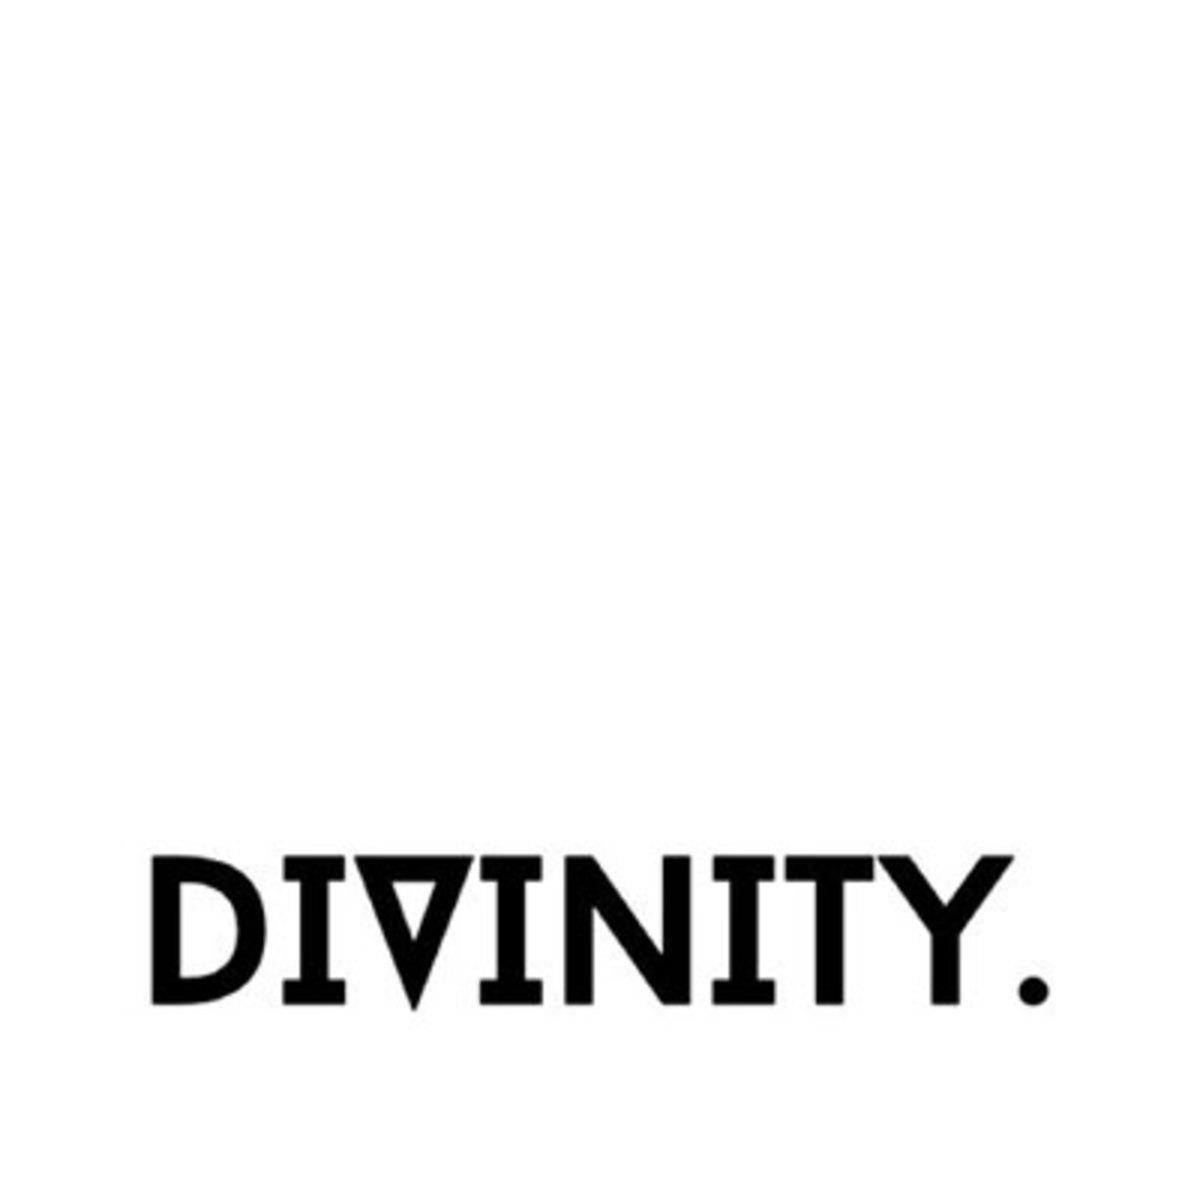 sza-divinity.jpg